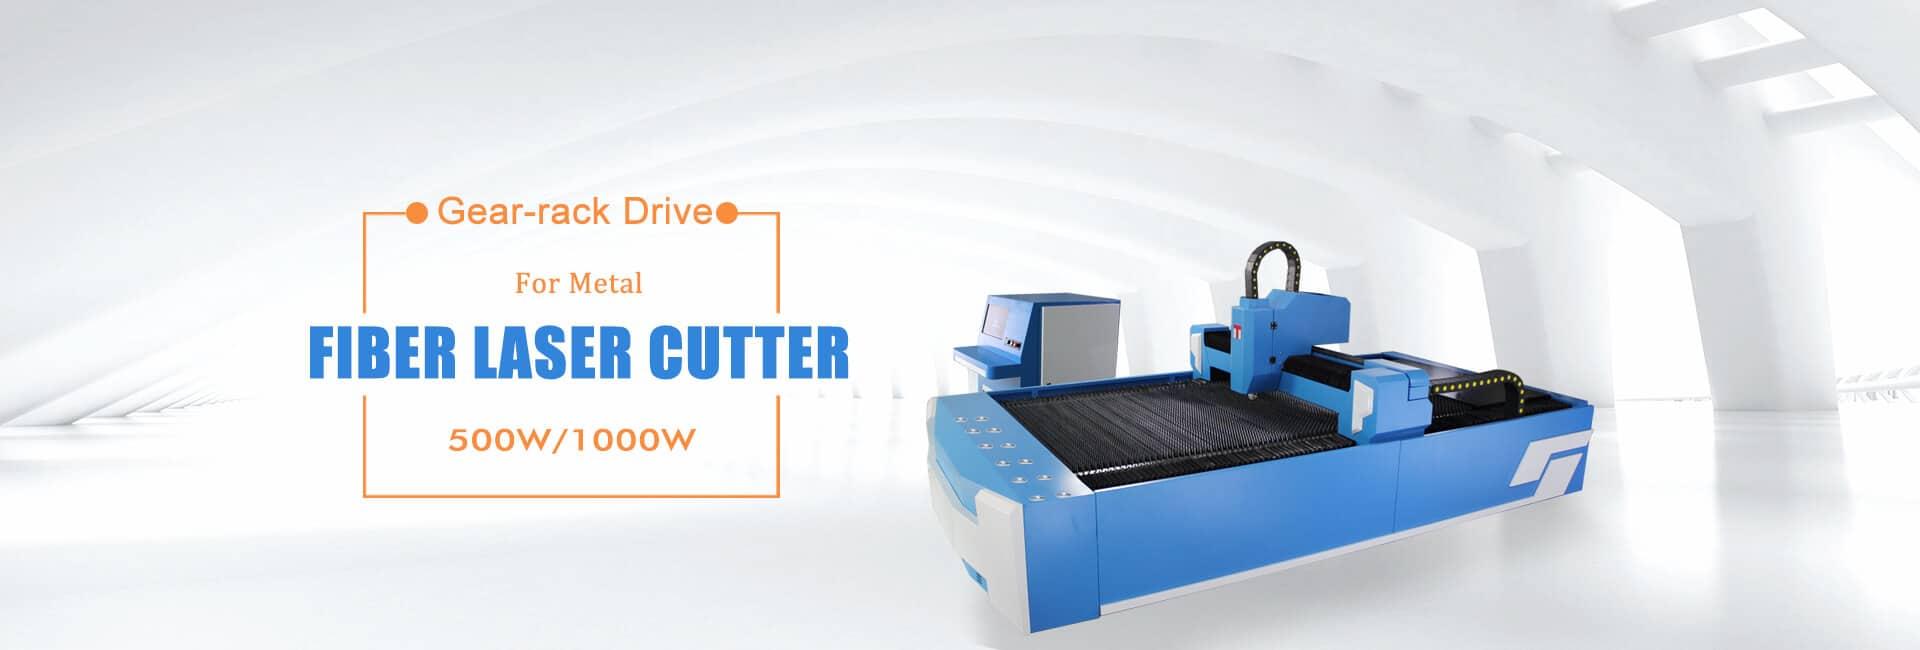 1000W fiber laser cutter